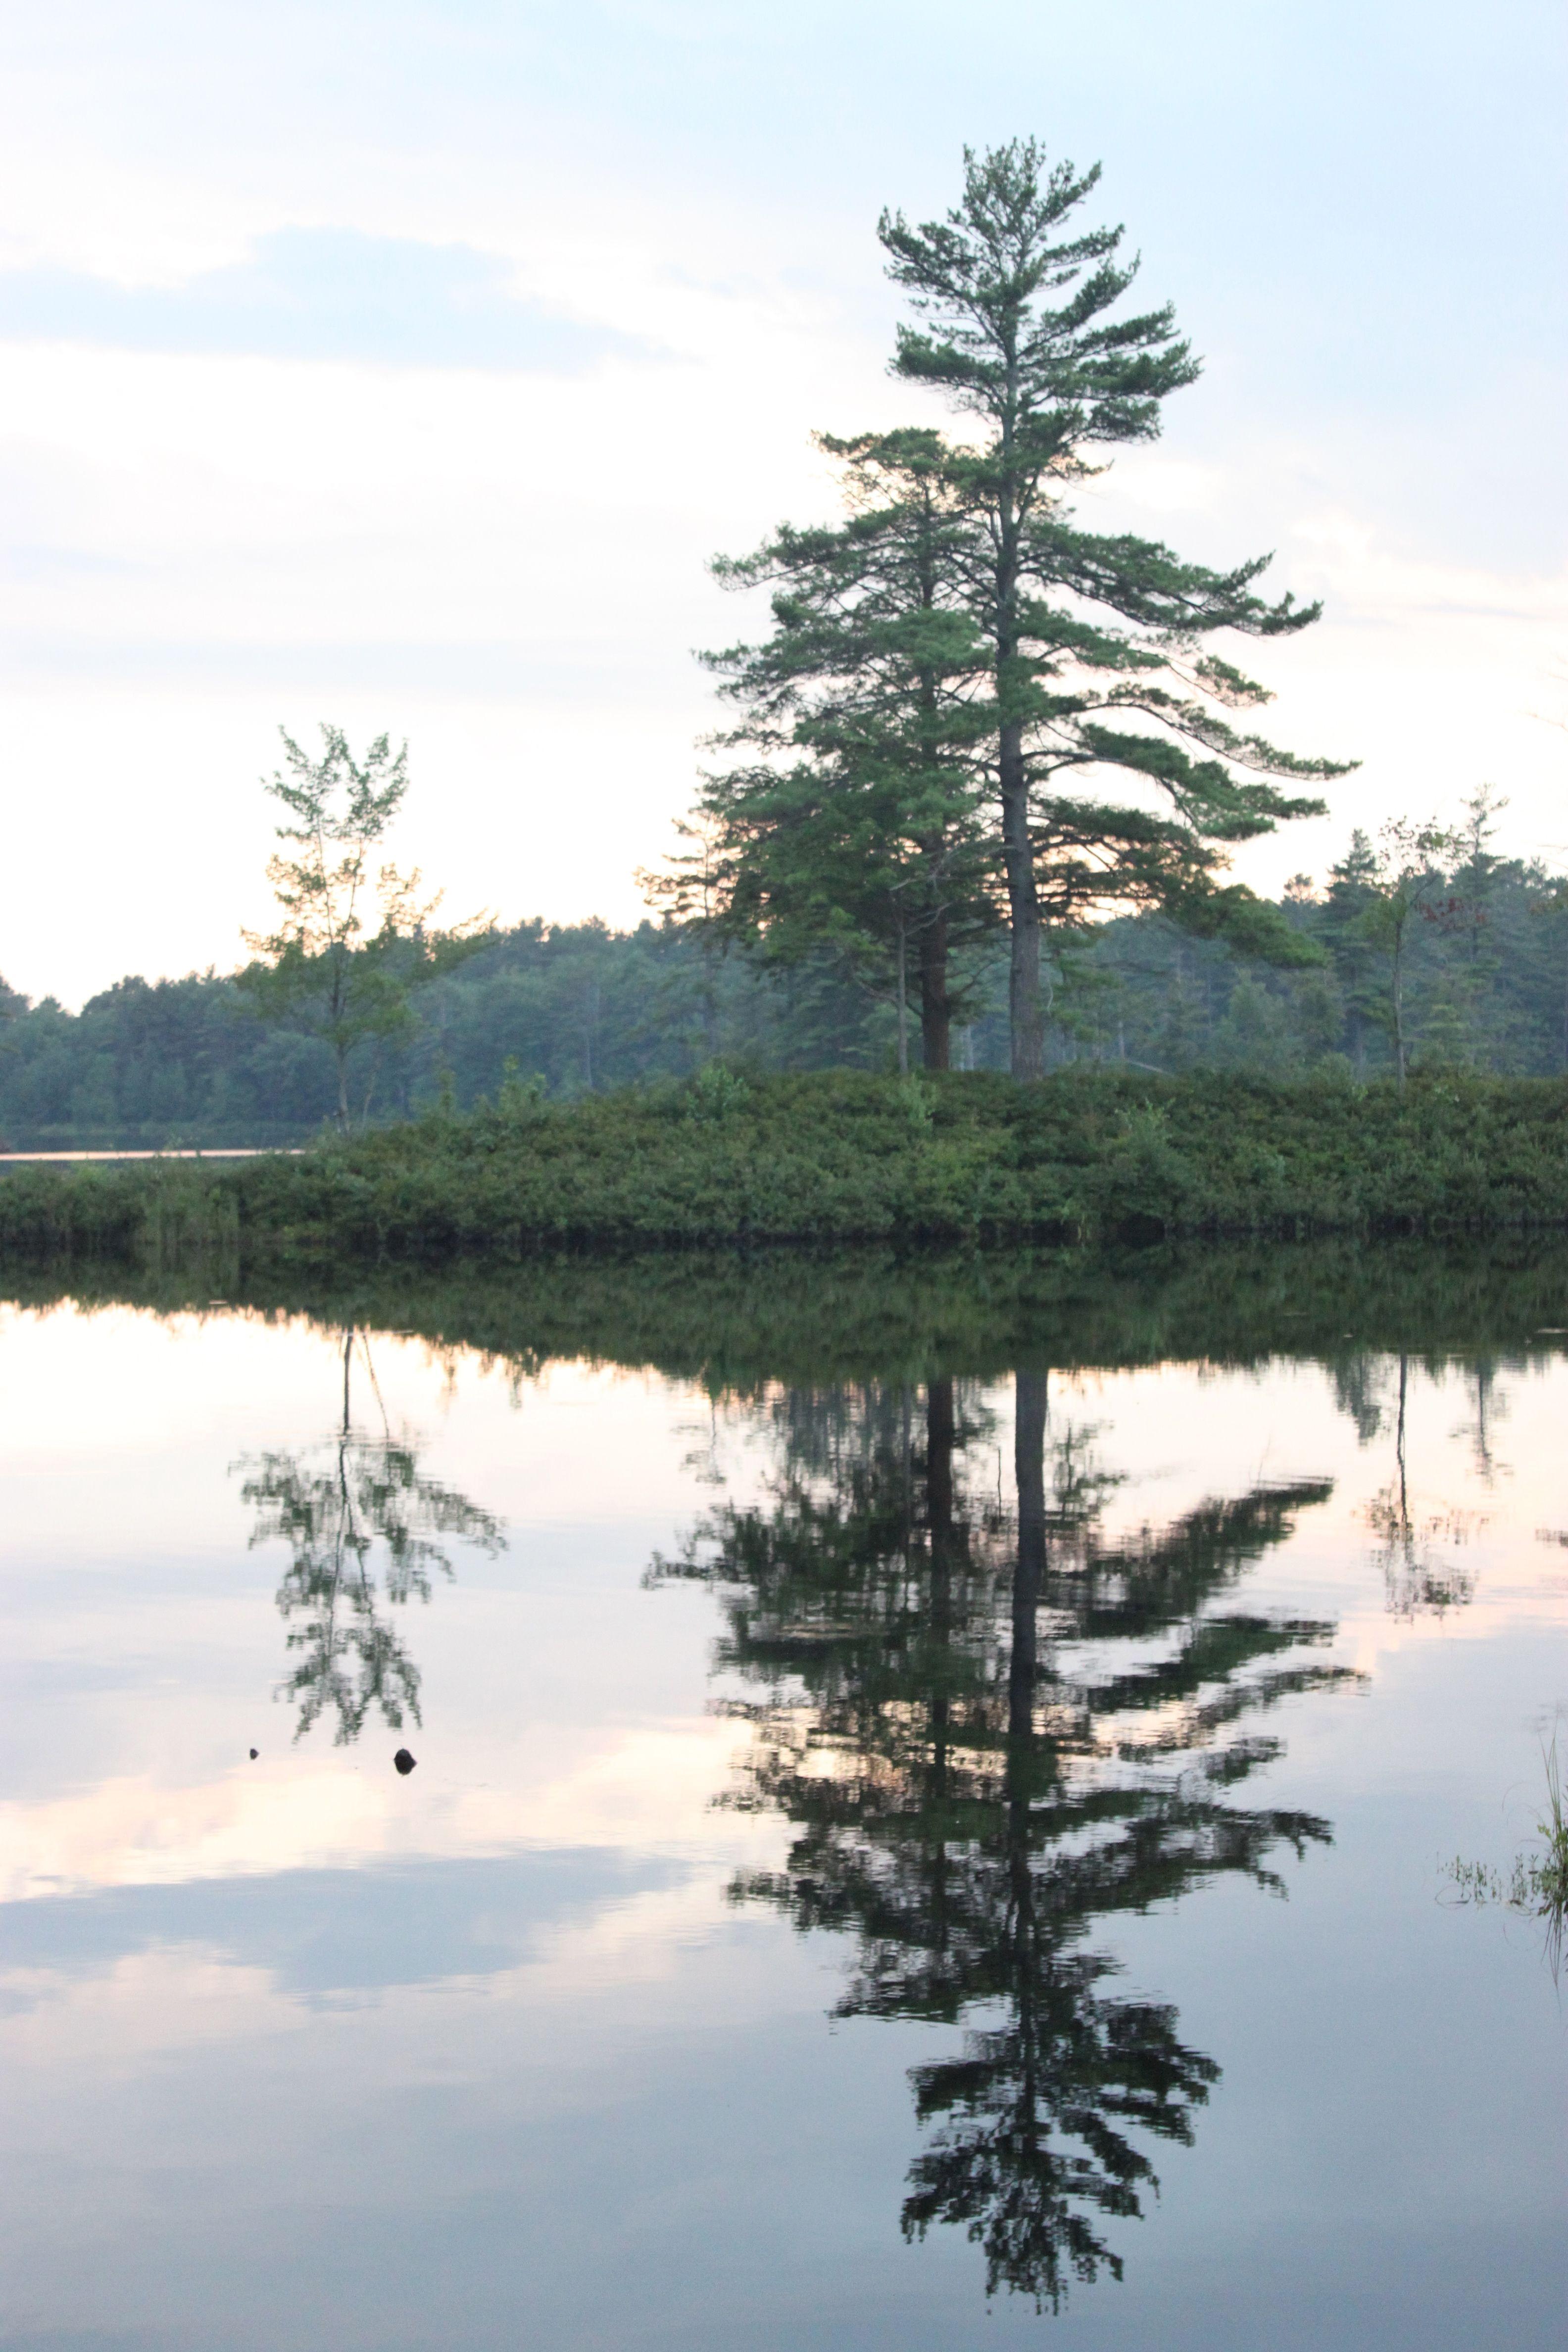 Tully Lake reflection. #reflection #photography #mirror